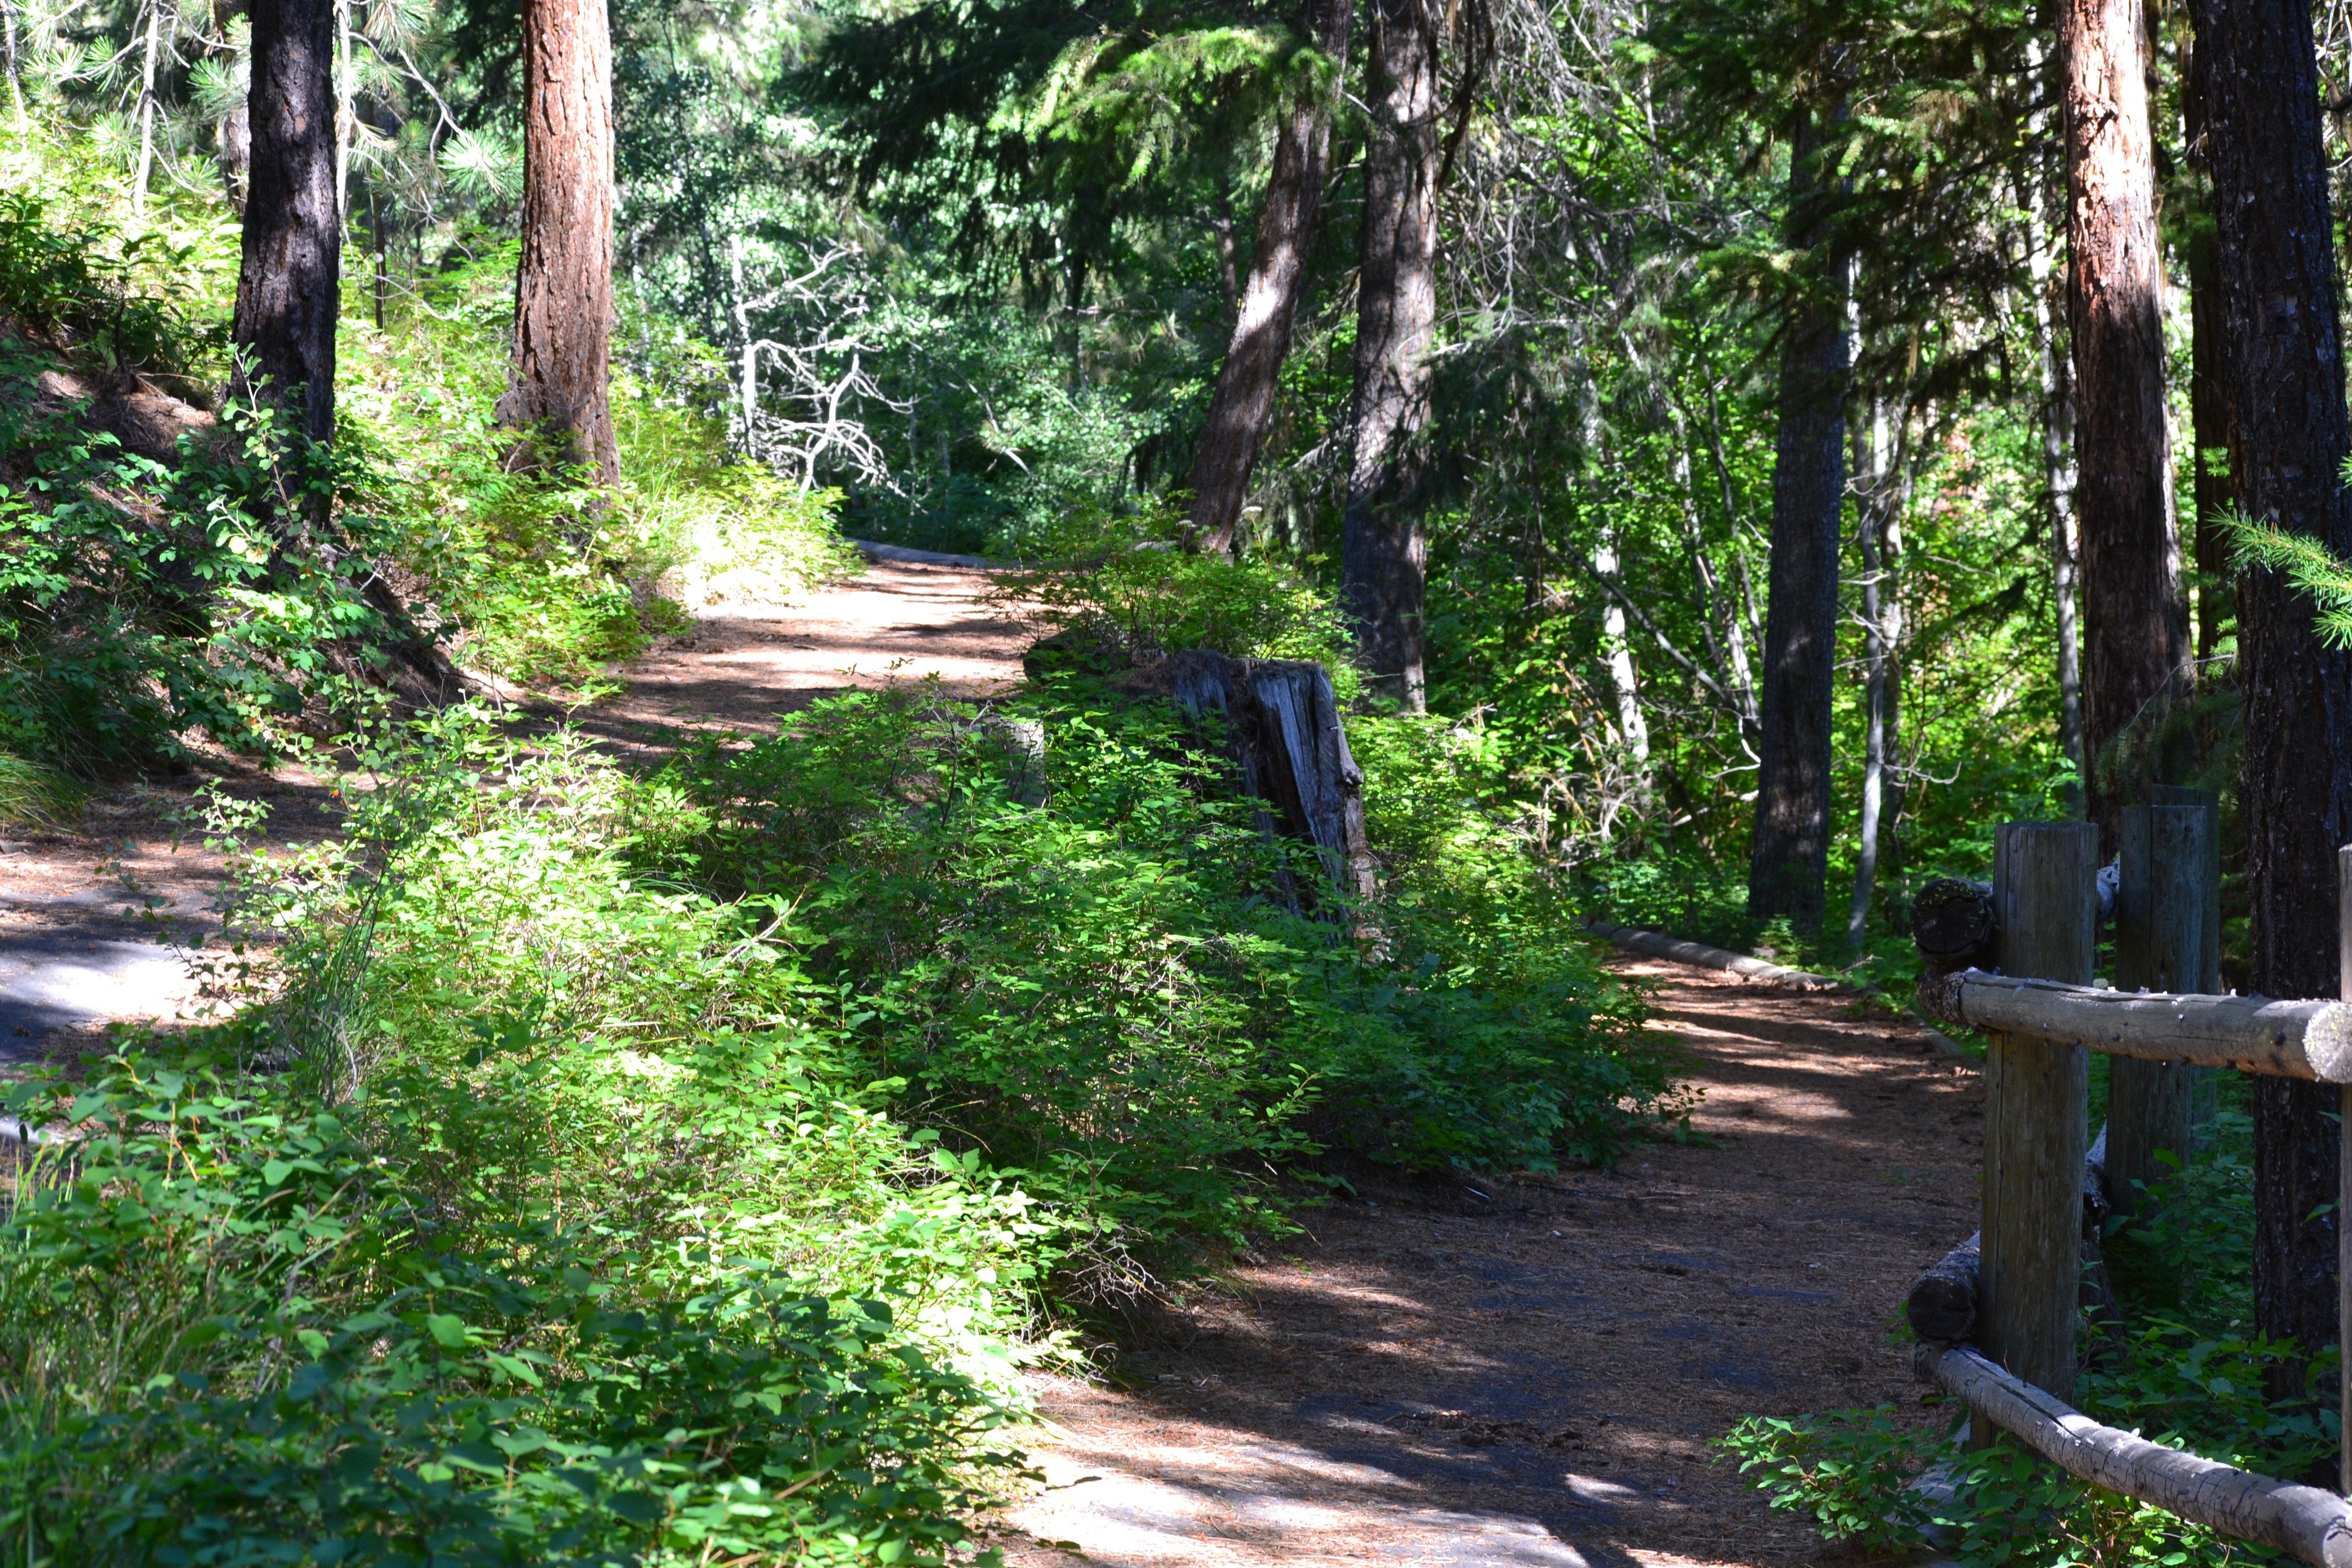 DSC_0031 (1)Wetmore trail to Yellow Pine CG